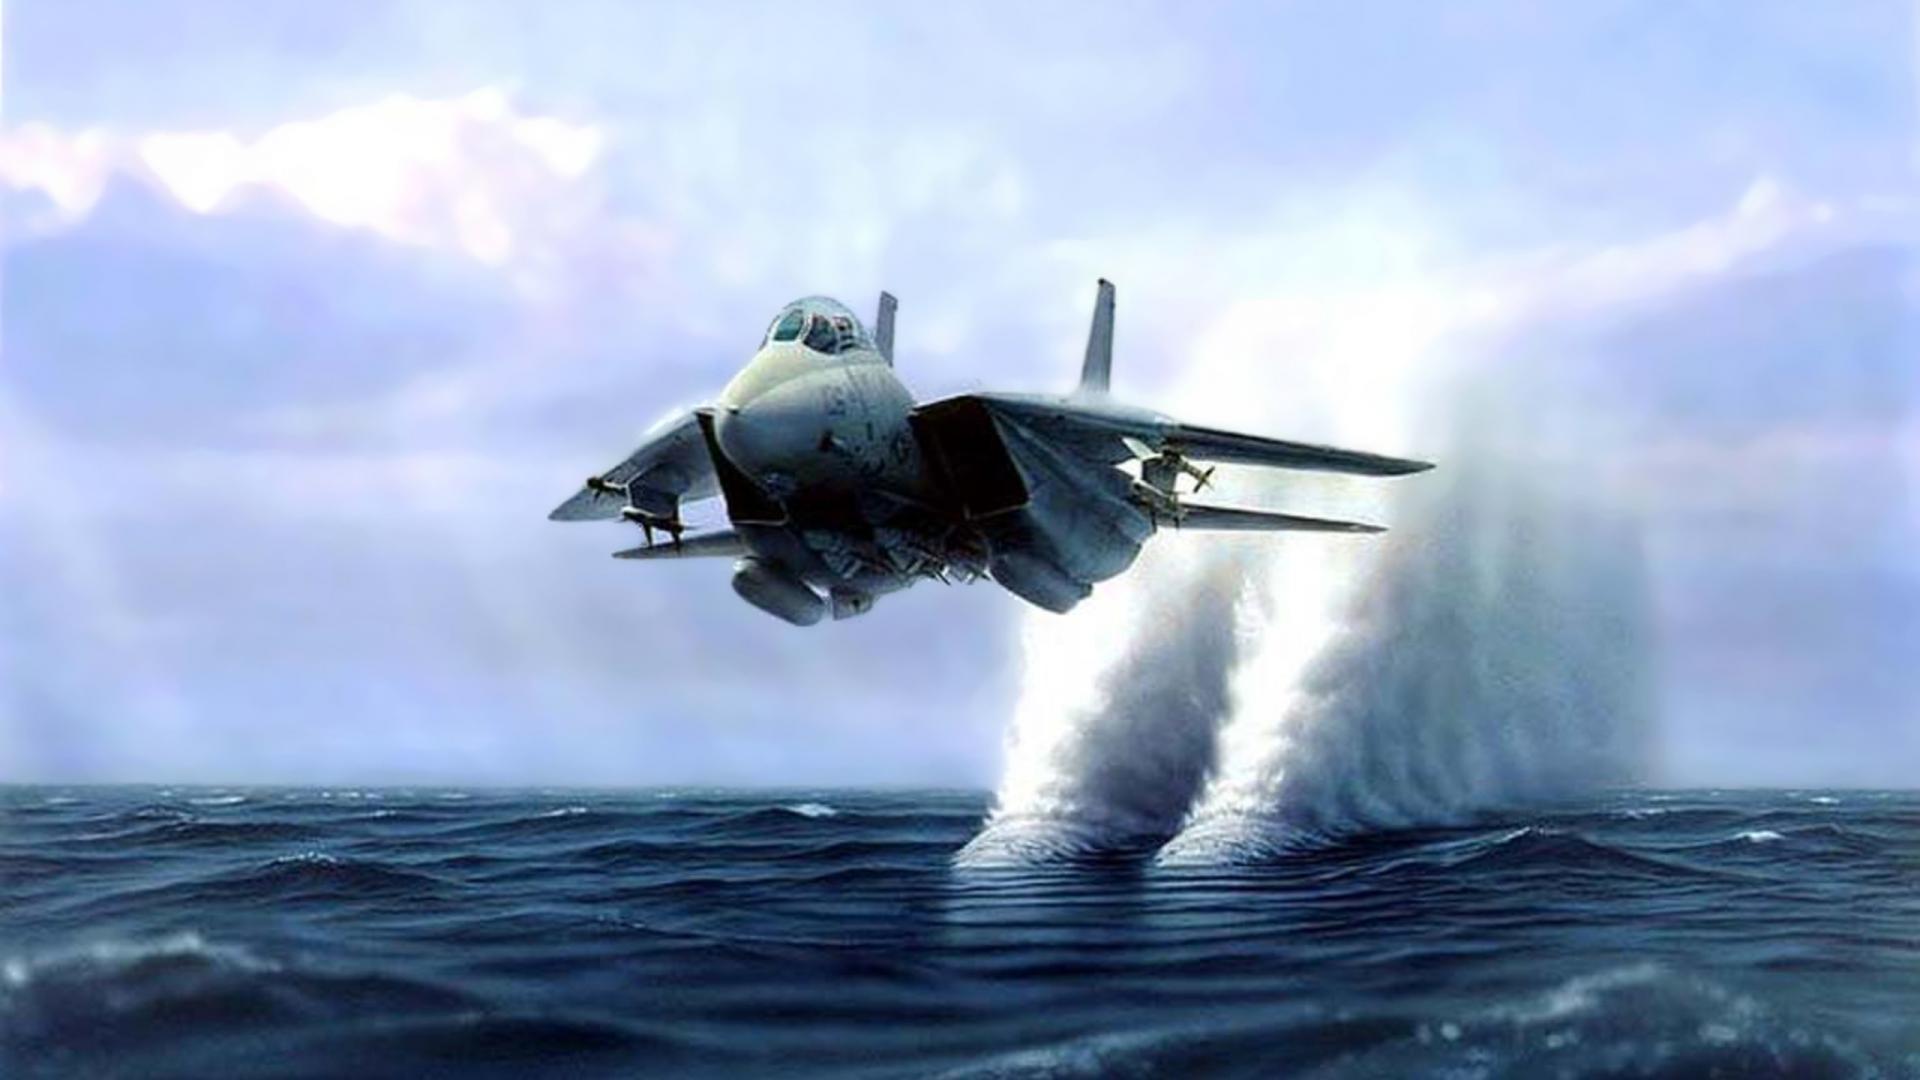 jet jets aircraft military desktop wallpaper download fighter jet jets 1920x1080